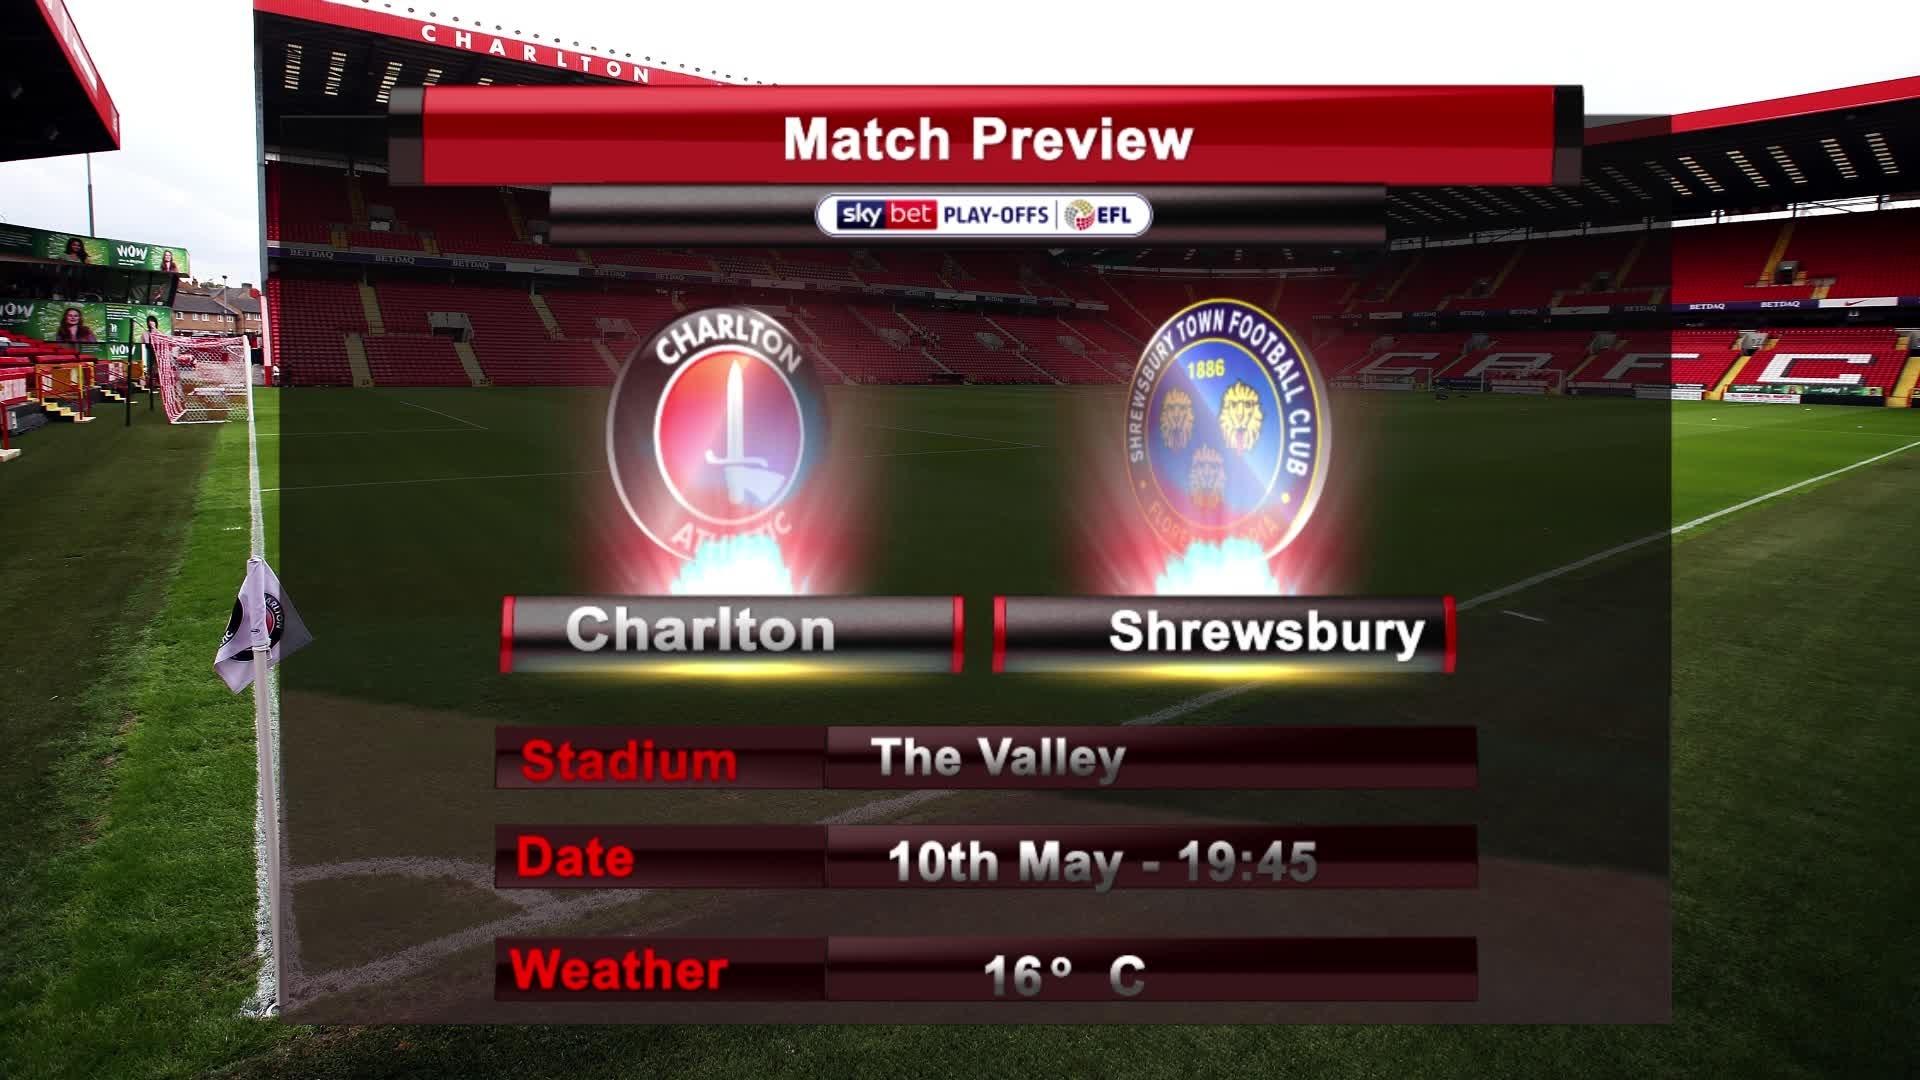 PLAY-OFF MATCH PREVIEW | Charlton vs Shrewsbury